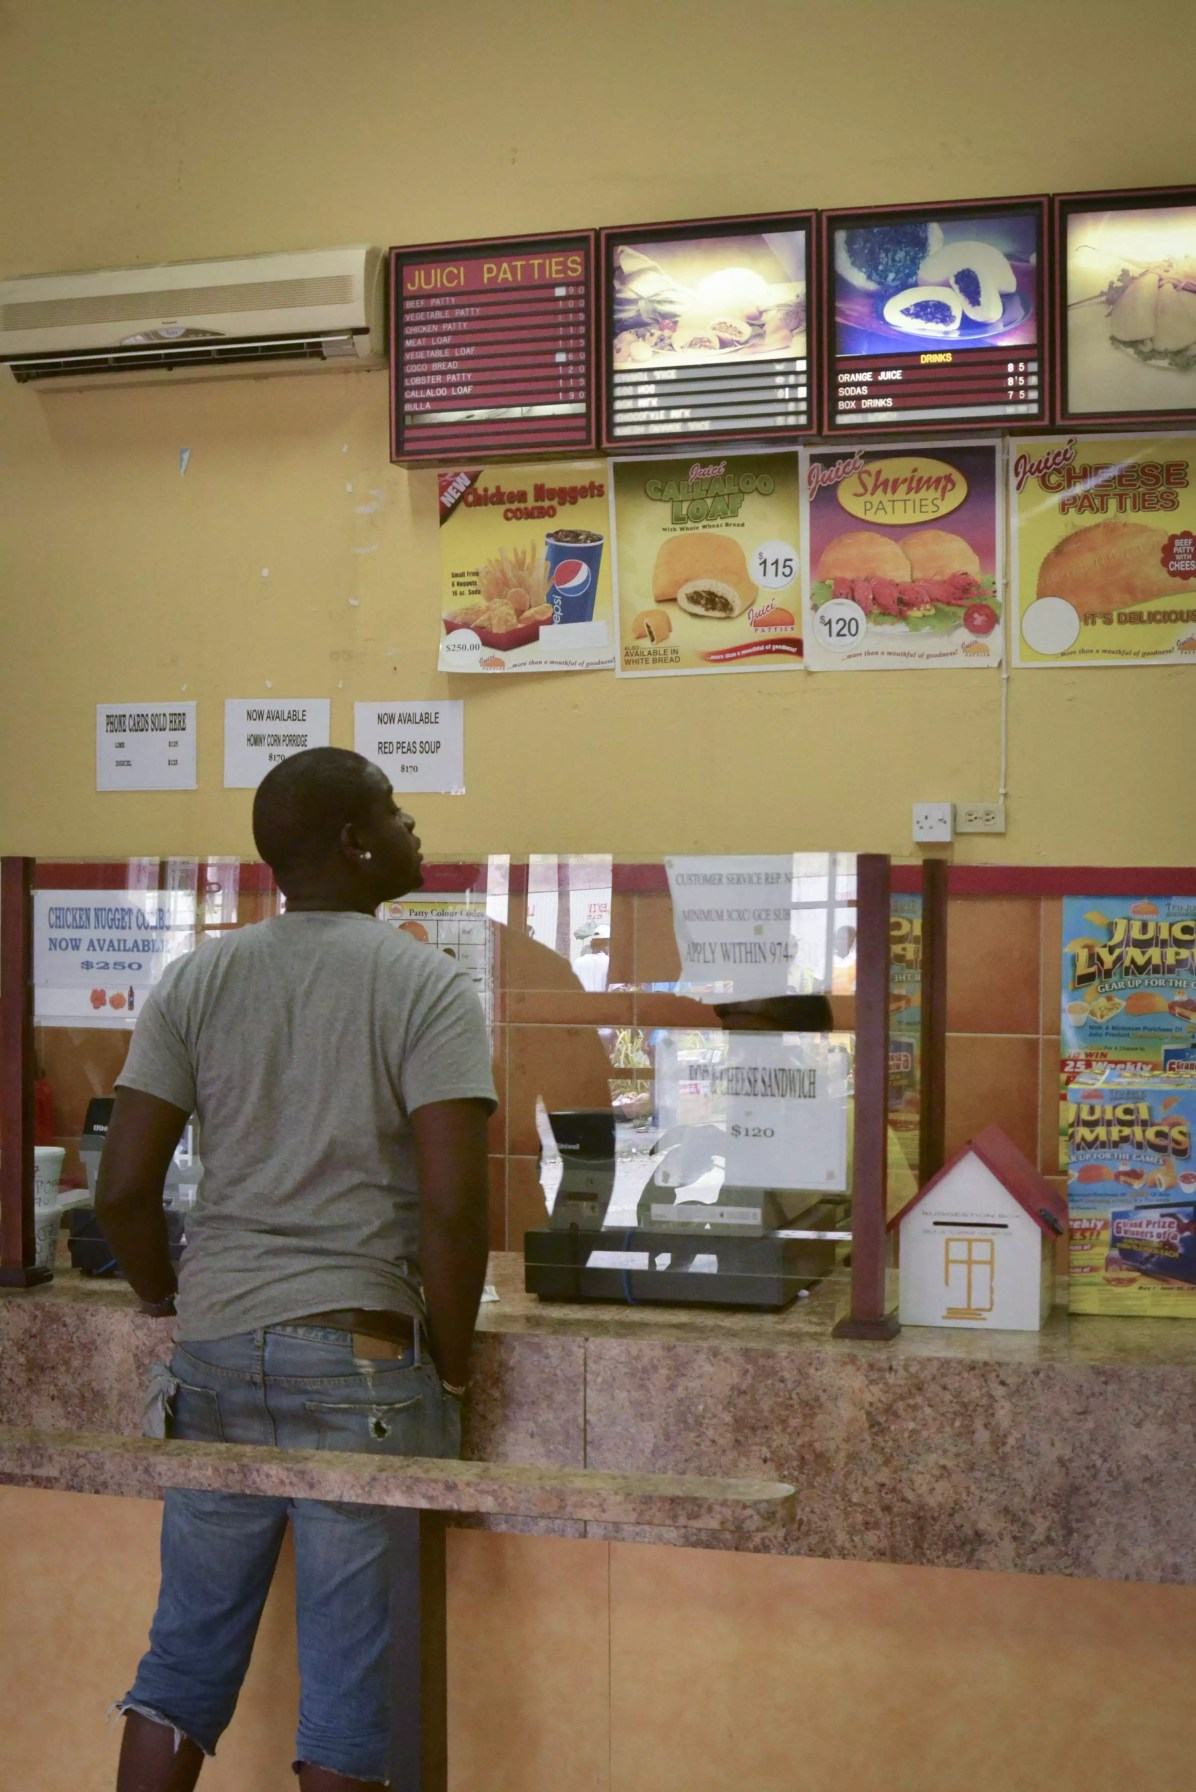 Foodie Jamaica: Juici Patties